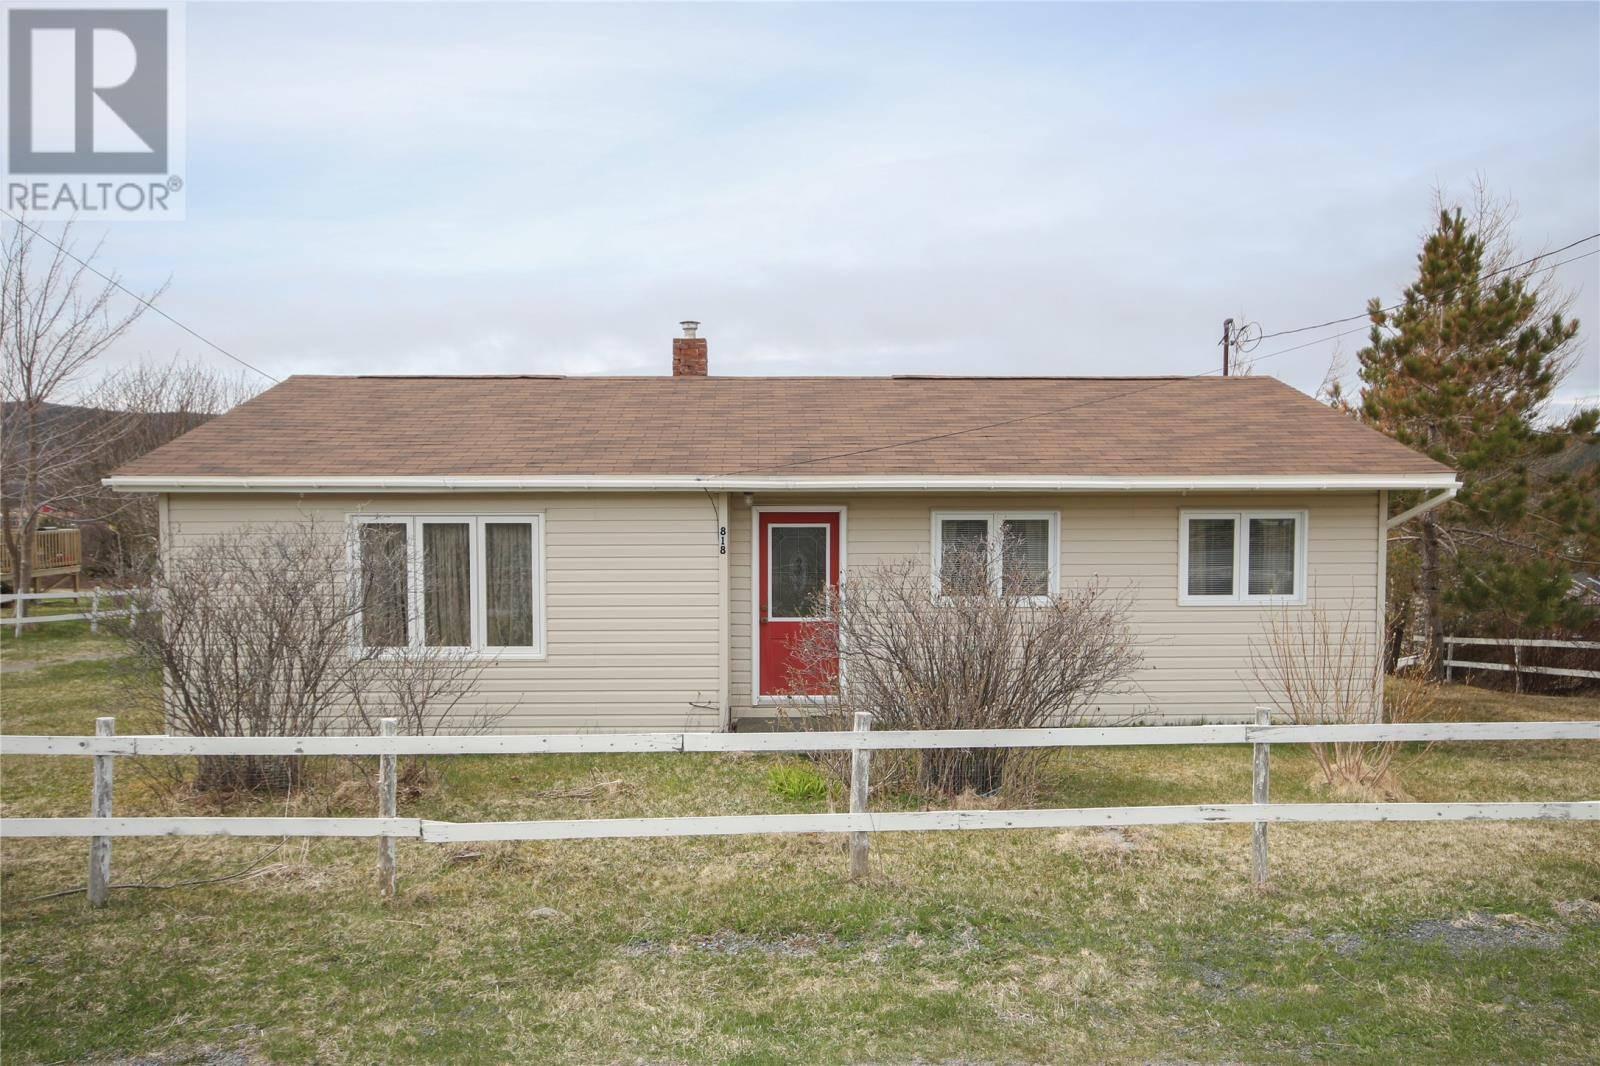 House for sale at 818 Harvey St Riverhead, Harbour Grace Newfoundland - MLS: 1209420